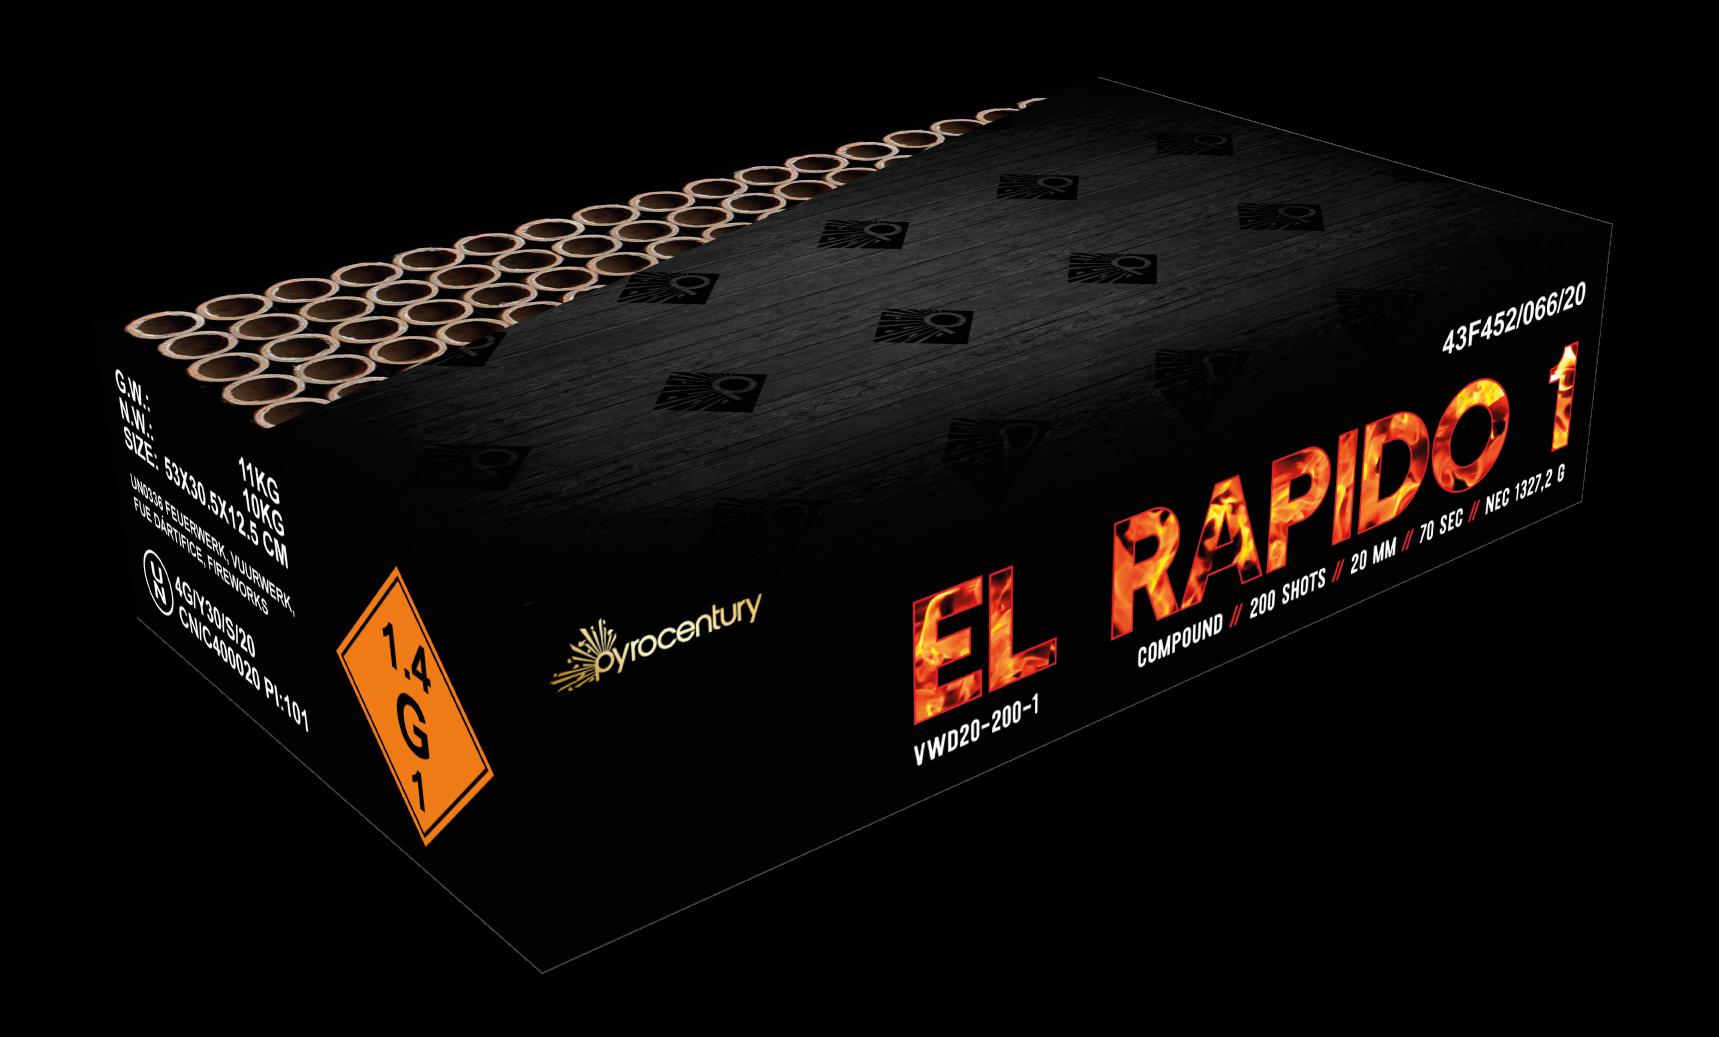 VWD El Rapido 1 – 200 Schots Compound